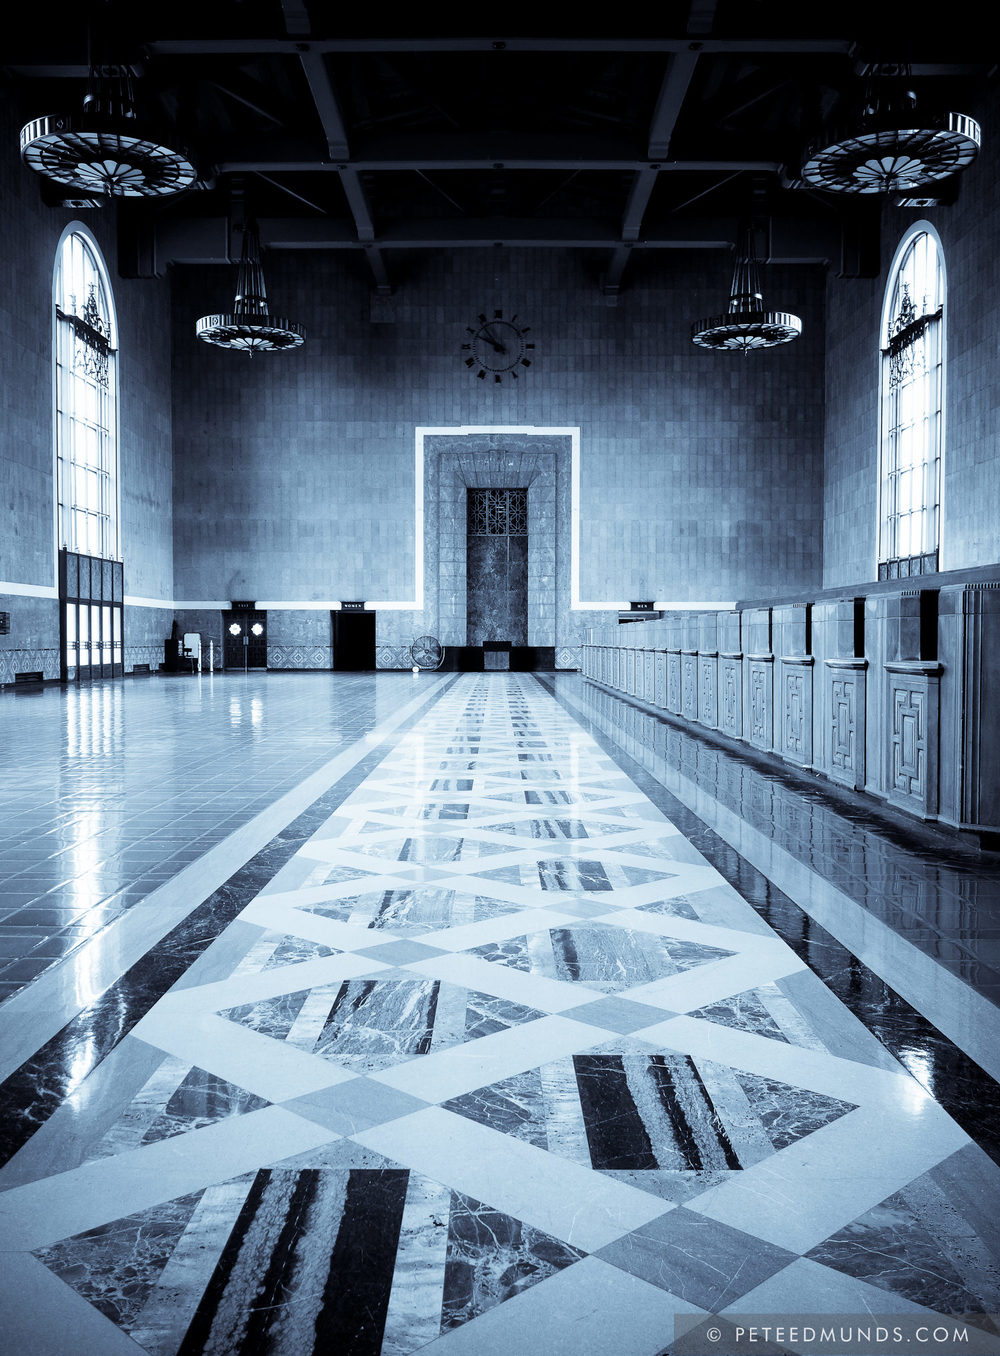 Old Ticketing Hall - Union Station - Los Angeles